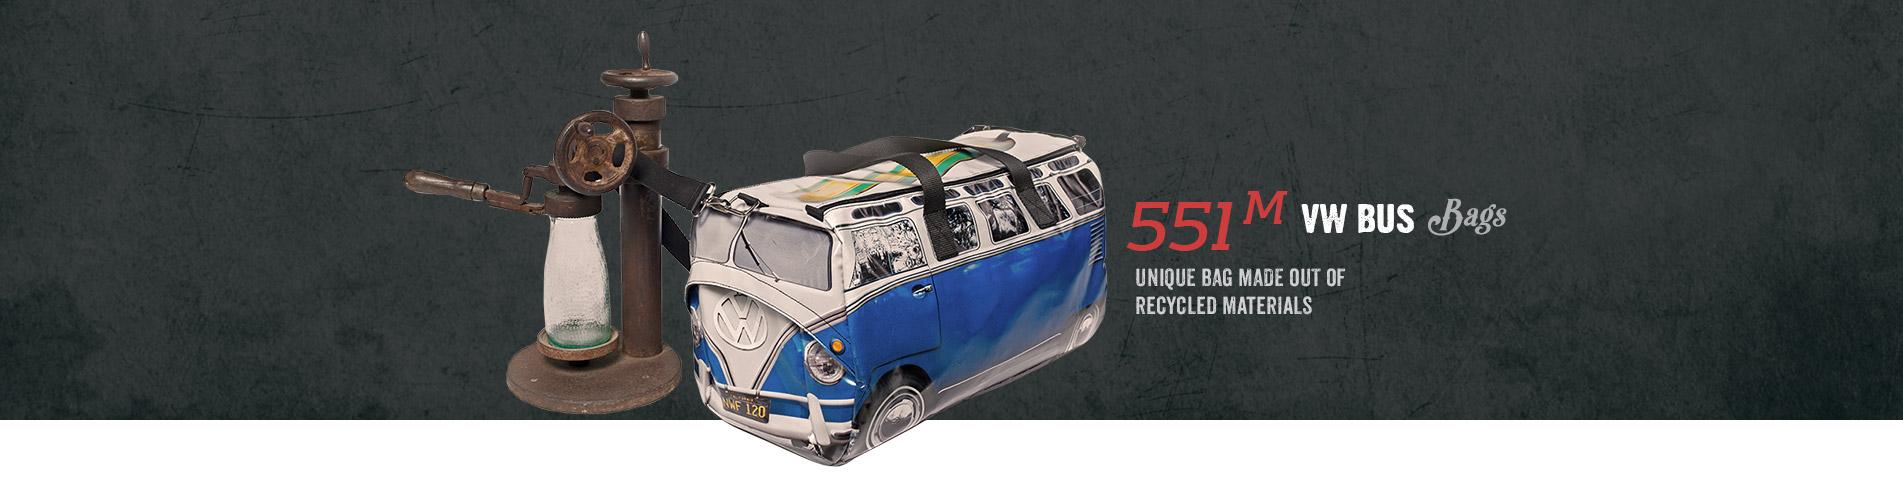 551 M VW Bus Bags